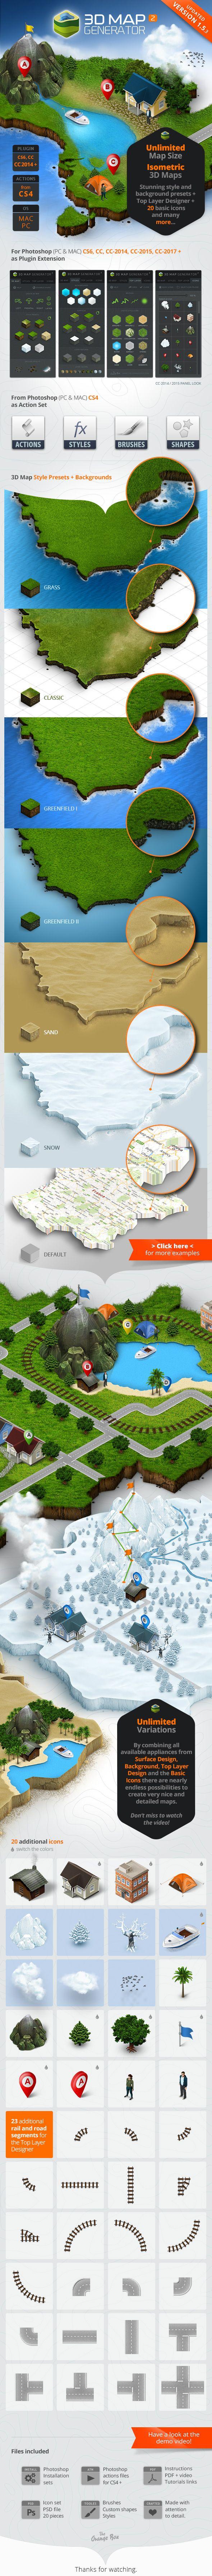 Best Concept Map Maker Ideas On Pinterest Pixel Game Maker - 3d map of prisons in us